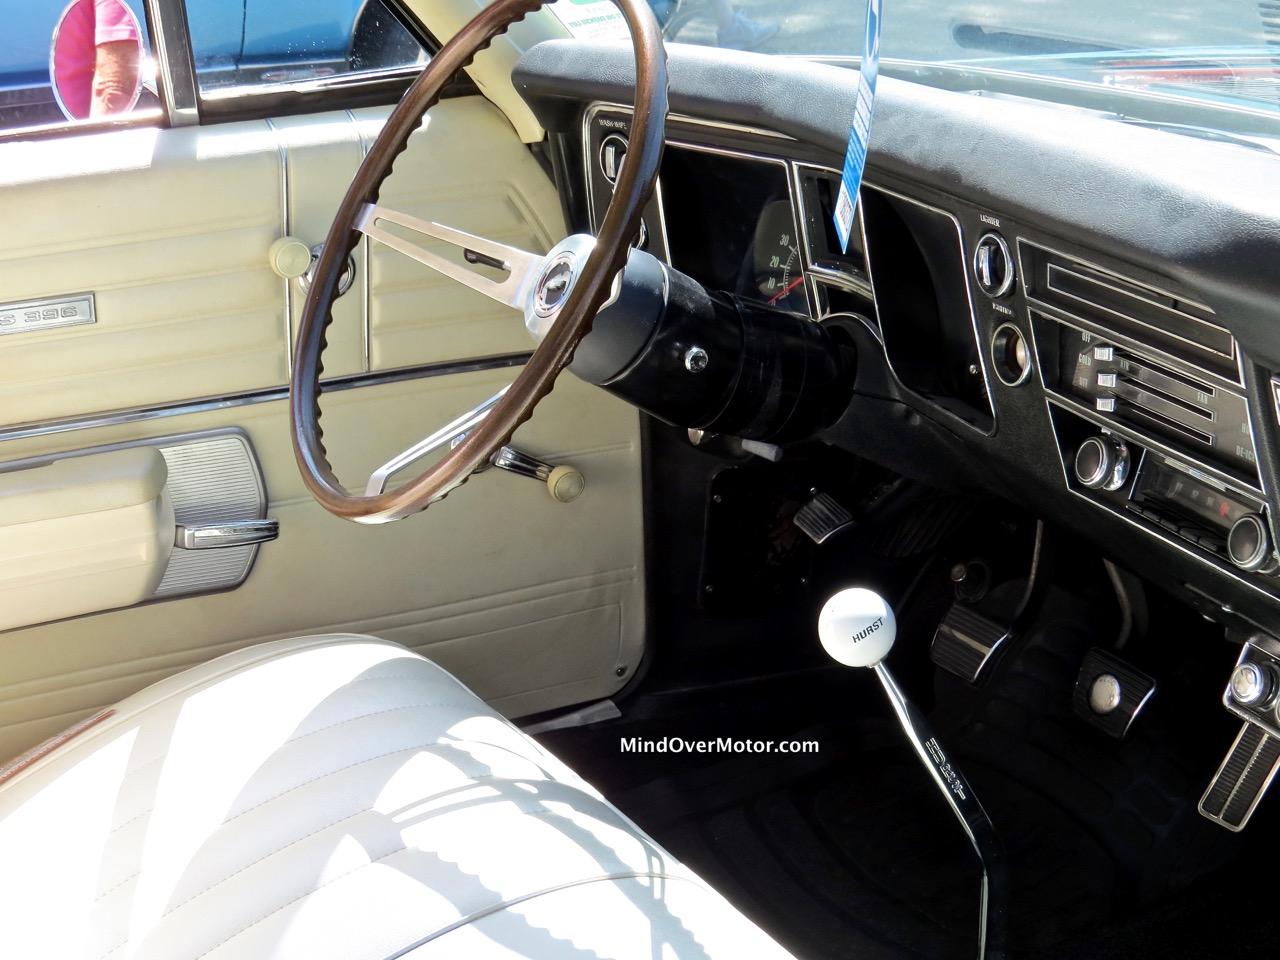 1968 Chevrolet Chevelle SS396 Interior